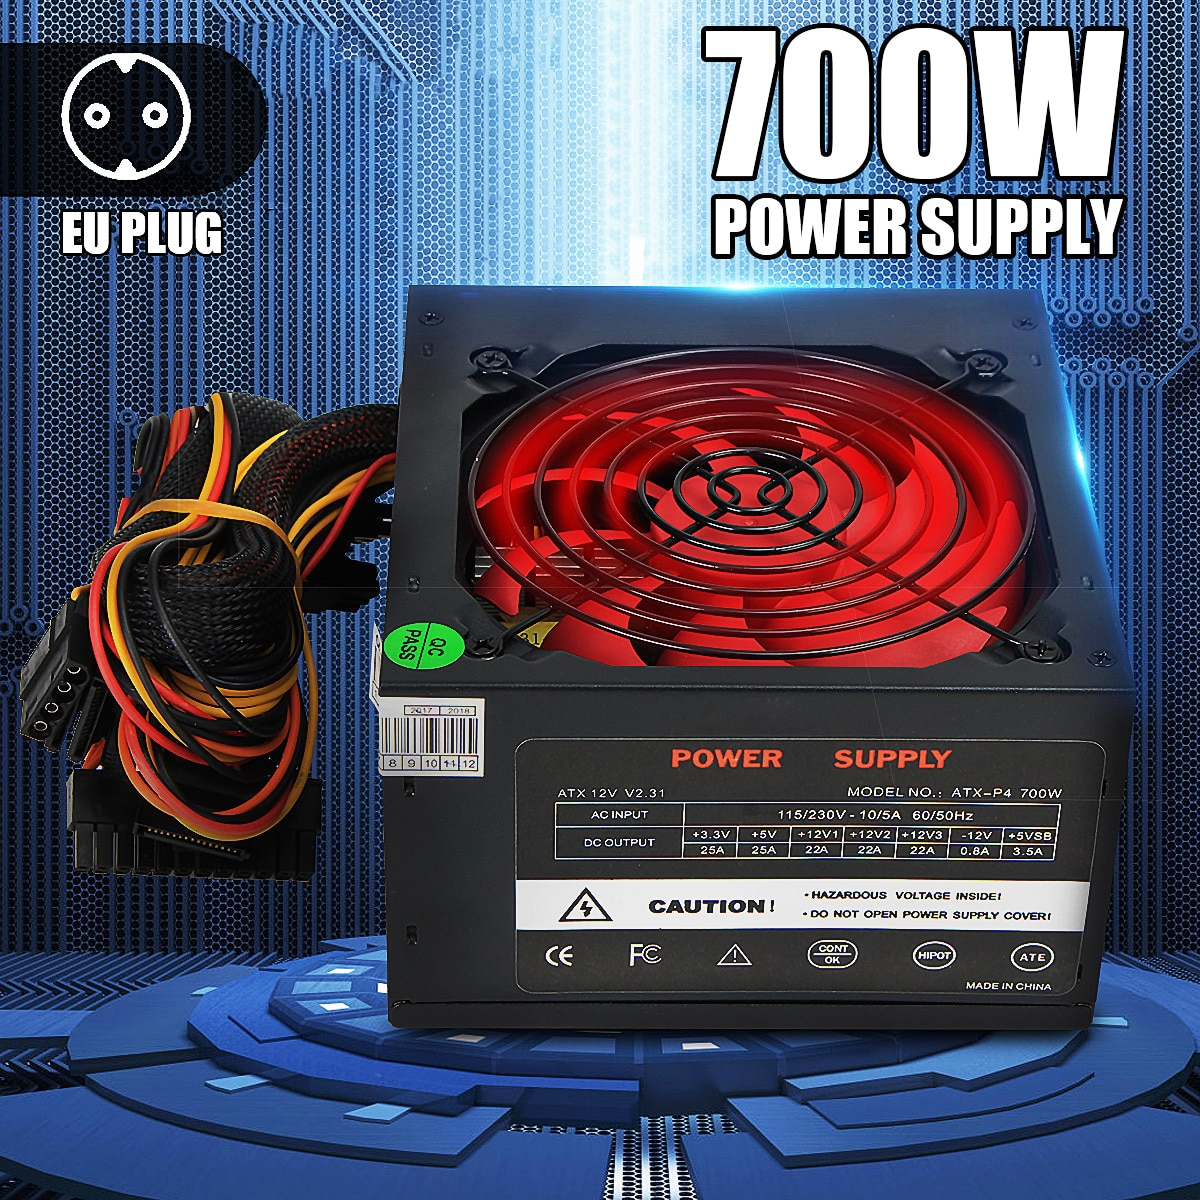 700W PCI SATA ATX 12V الألعاب PC امدادات الطاقة 24Pin/موليكس/Sata 12 سنتيمتر مروحة جديد الكمبيوتر امدادات الطاقة ل BTC